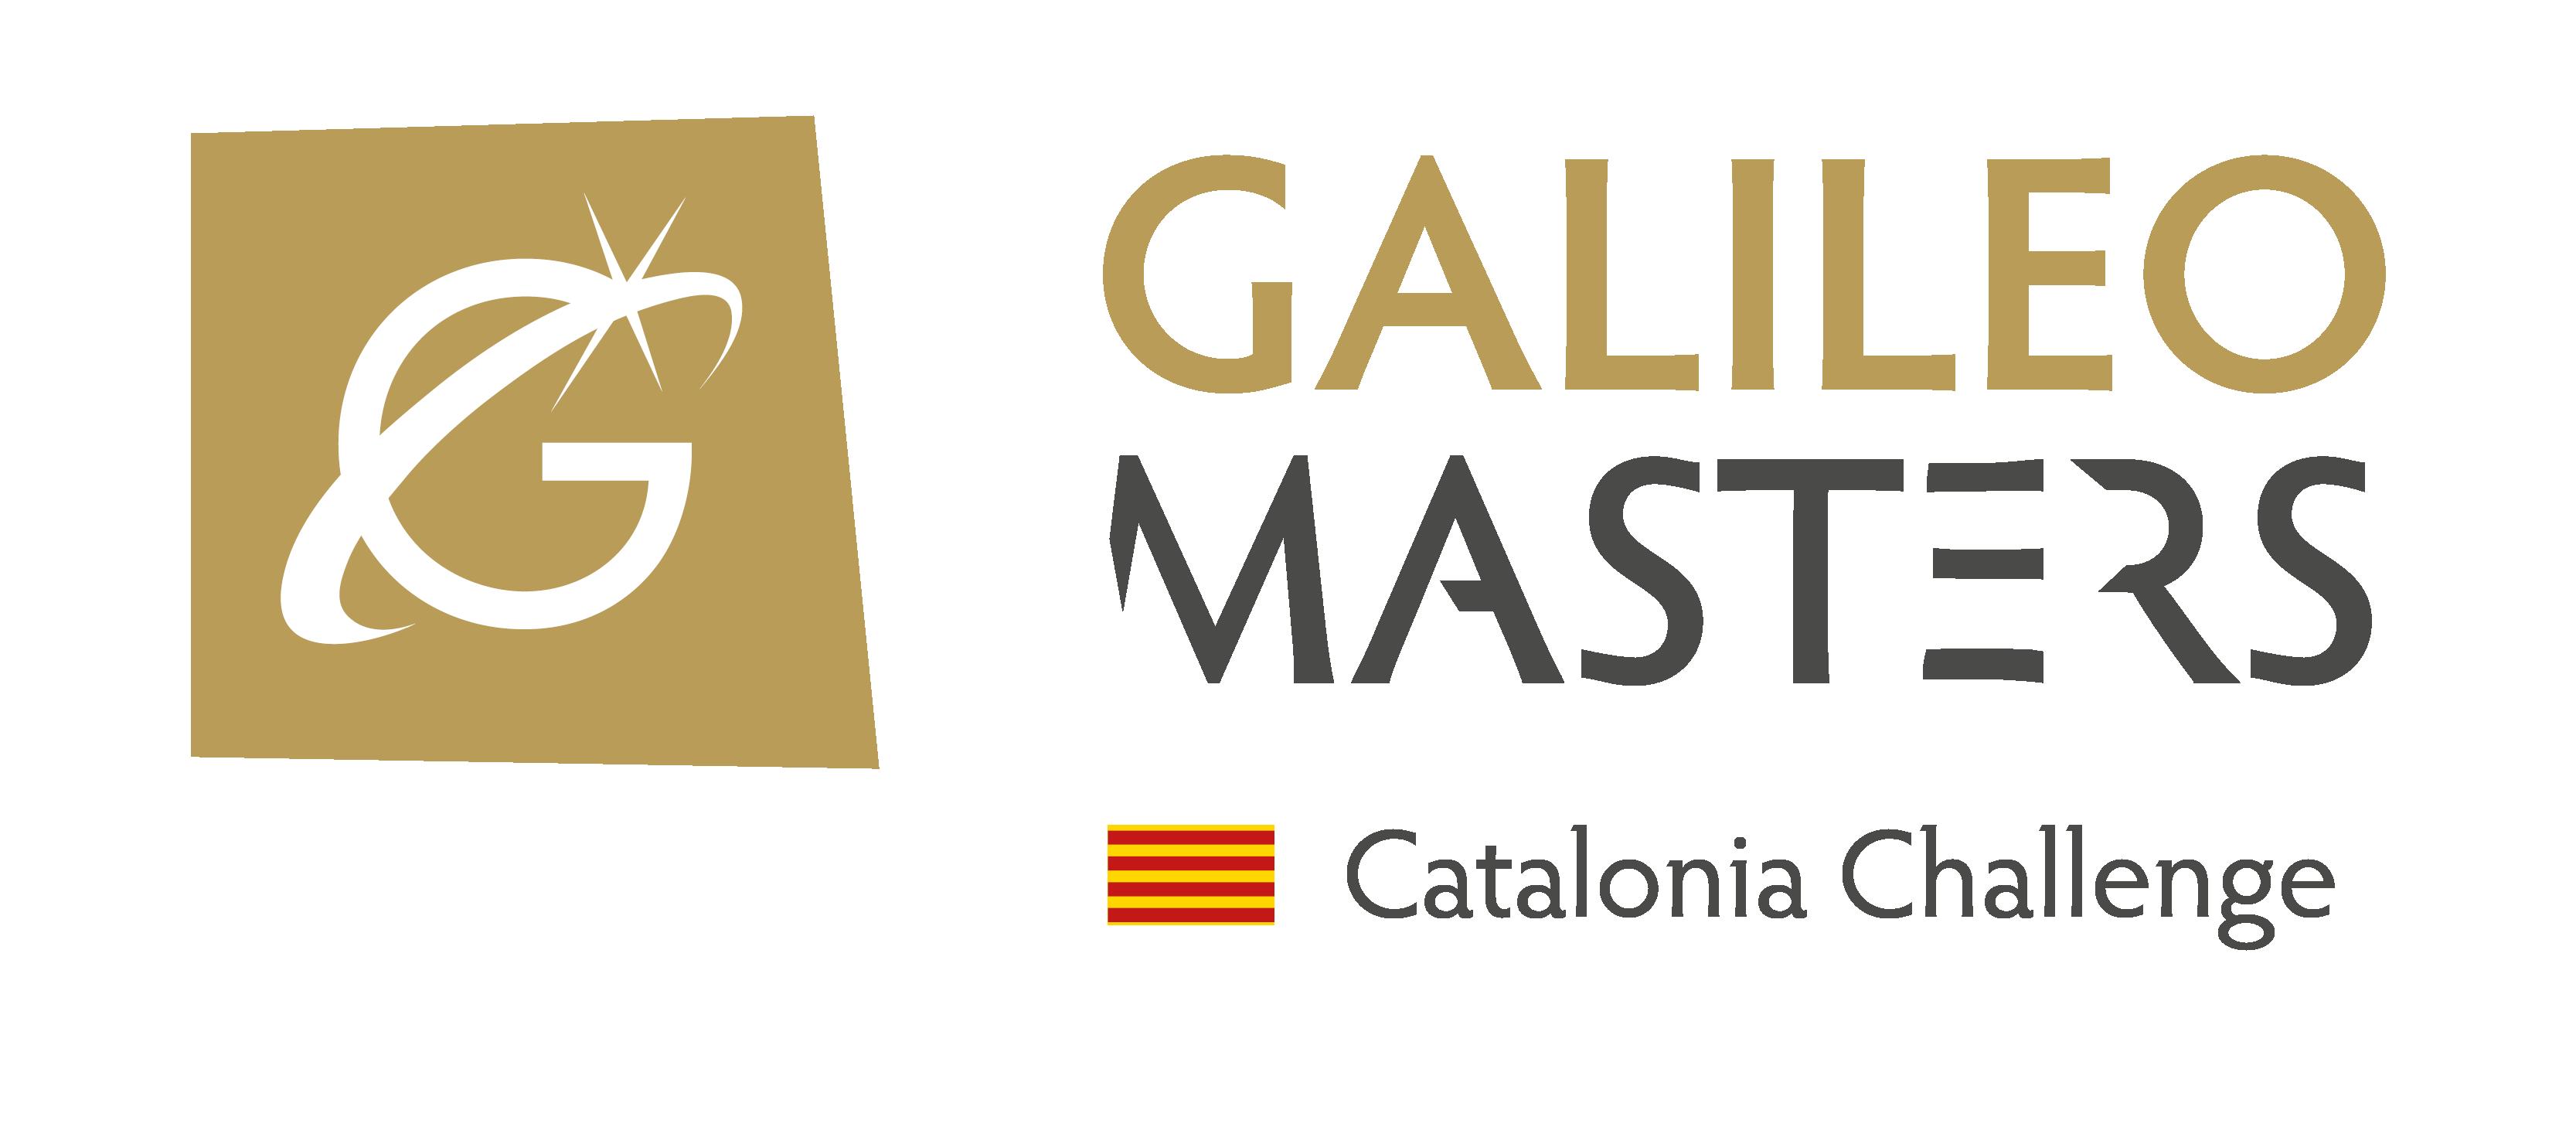 Galileo Masters Catalonia Challenge